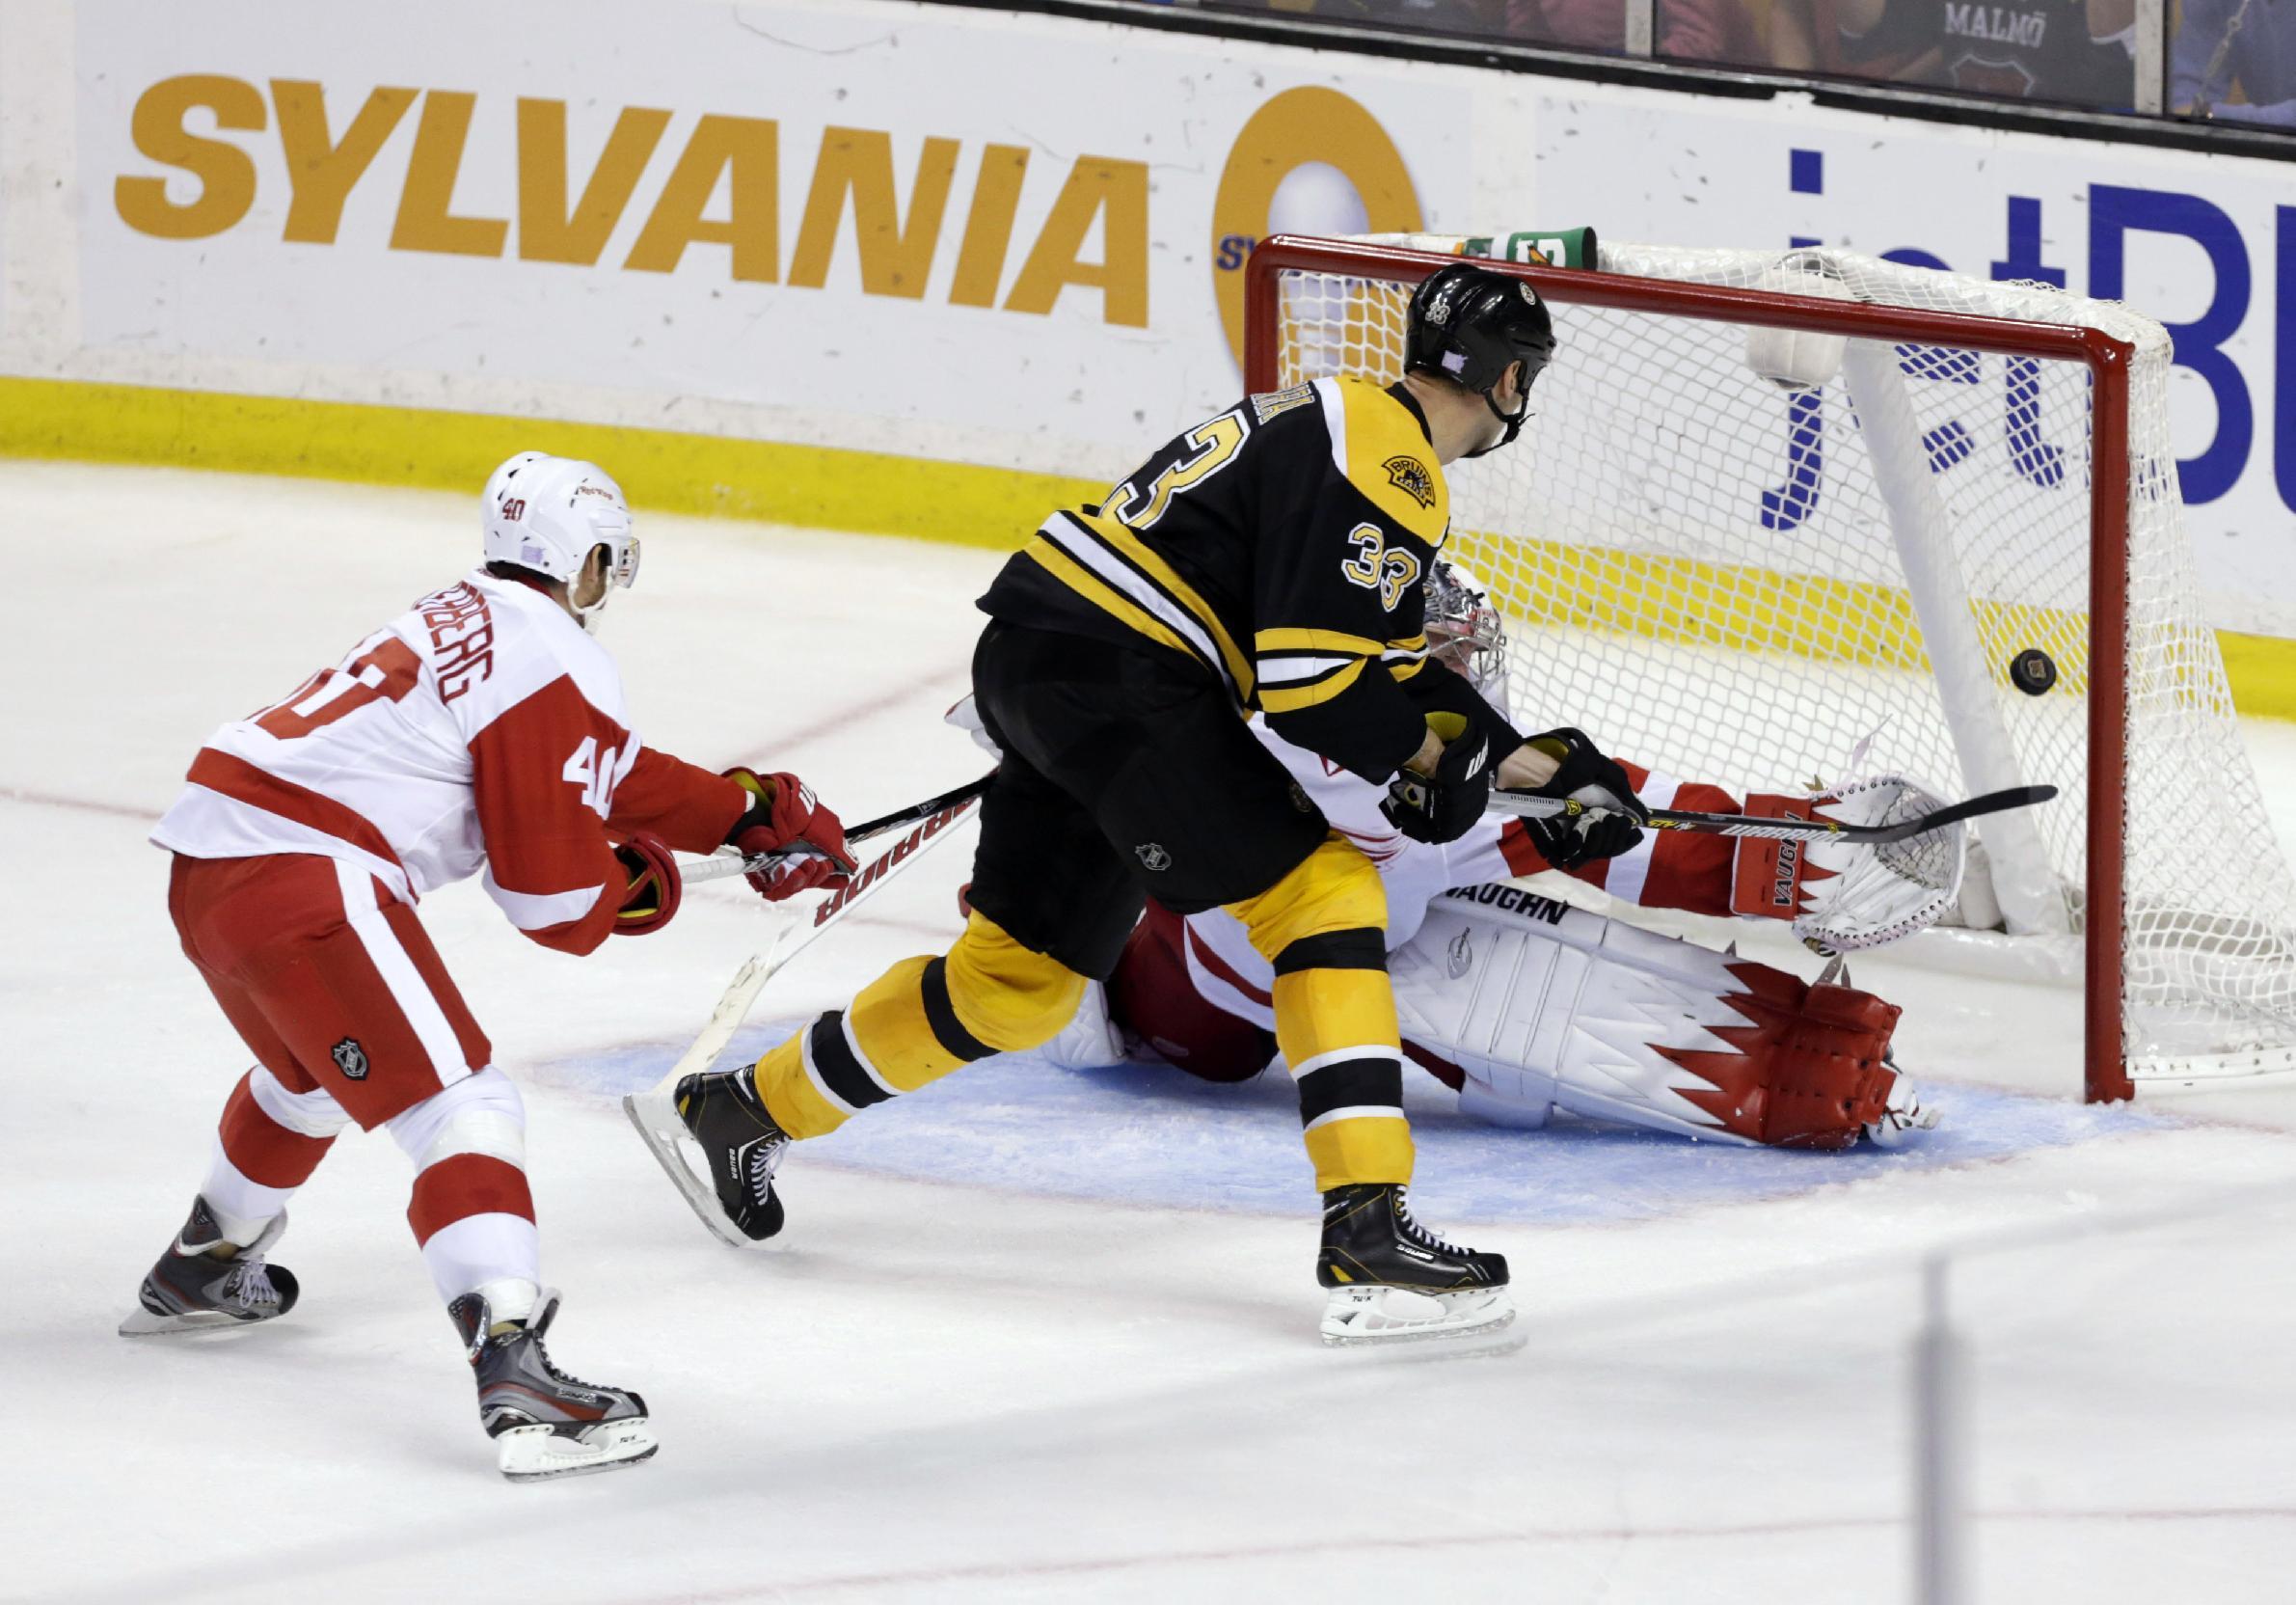 Rask stops 25 shots; Bruins beat Red Wings 4-1